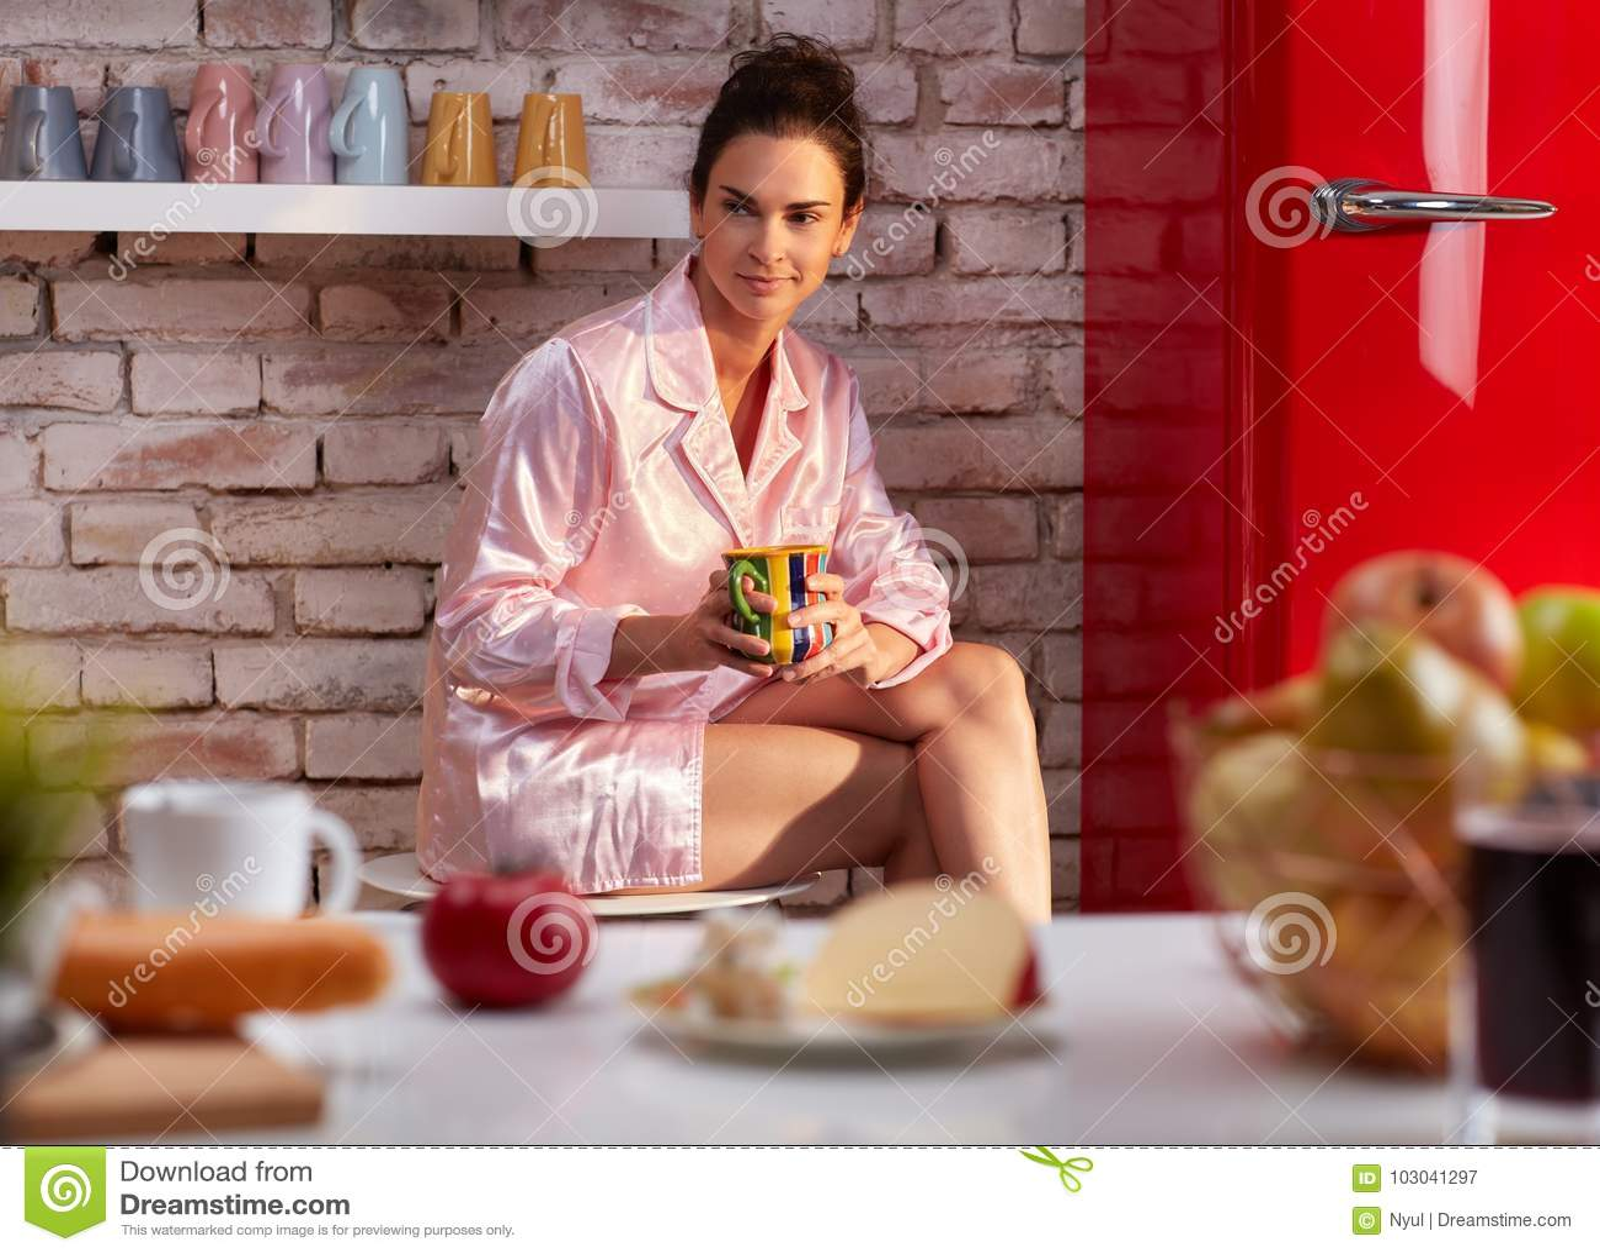 Junge Frau trinkt Frühstückskaffee im Pyjama